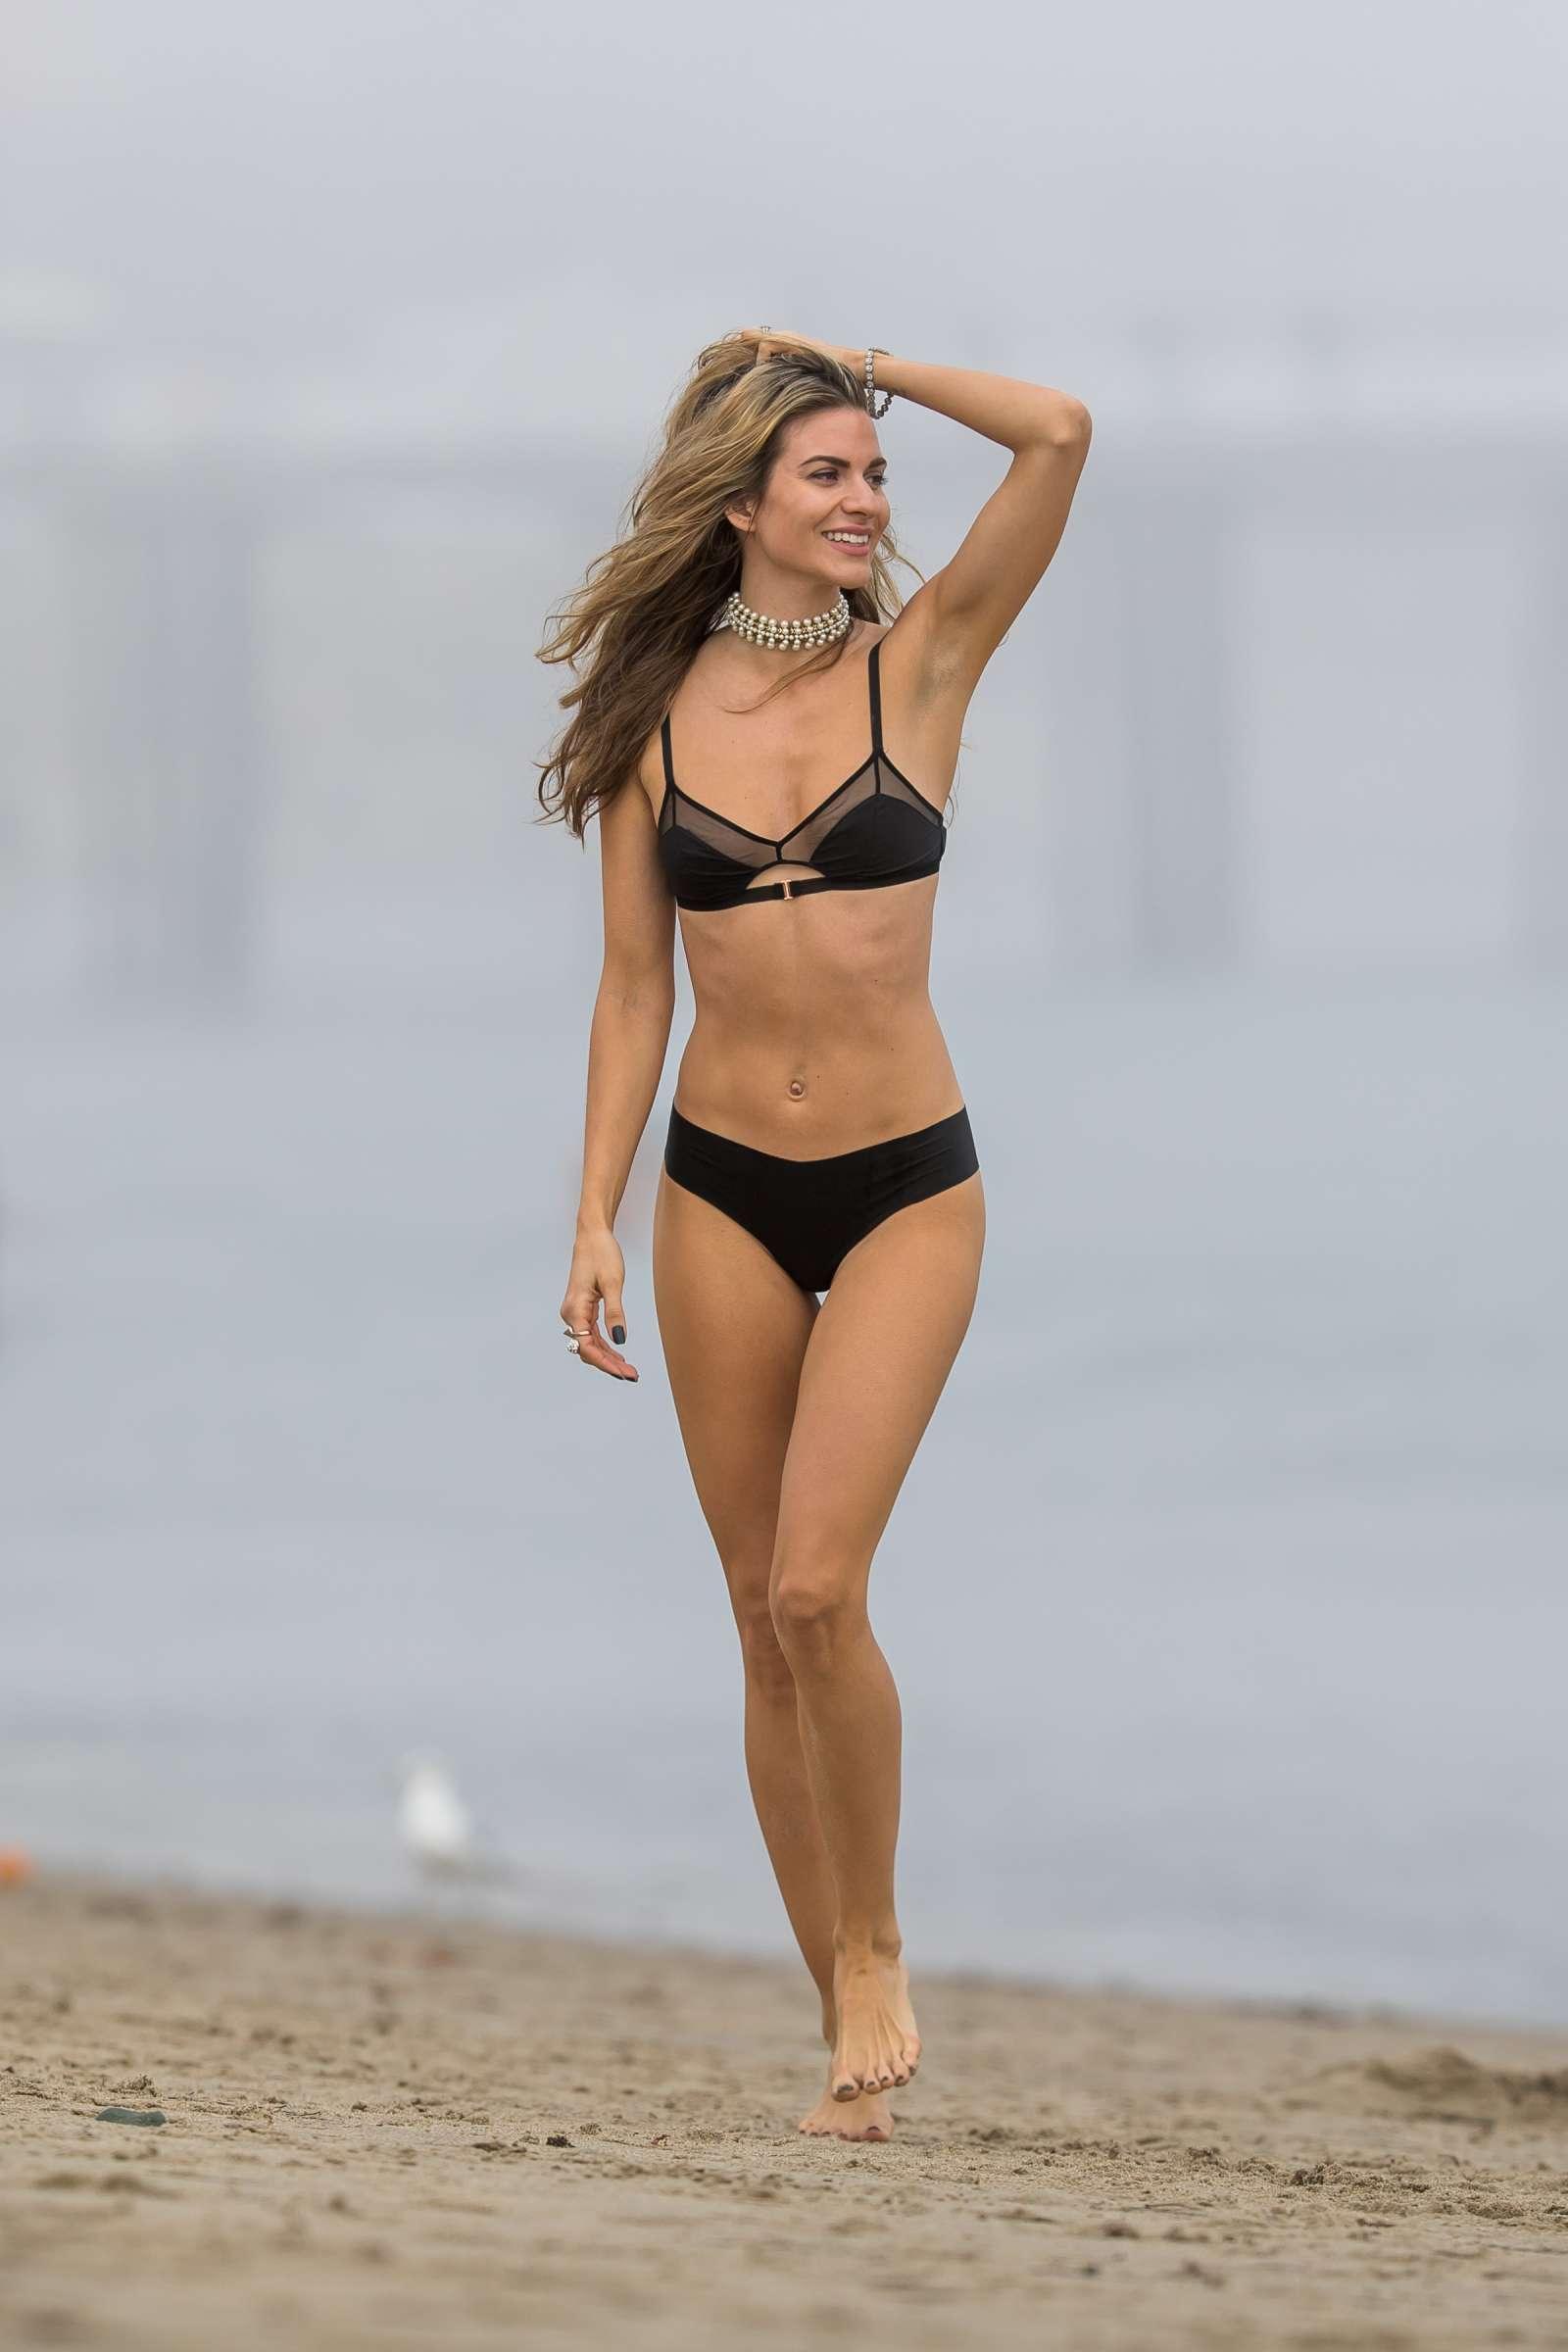 Rachel McCord in Black Bikini at a beach in Malibu